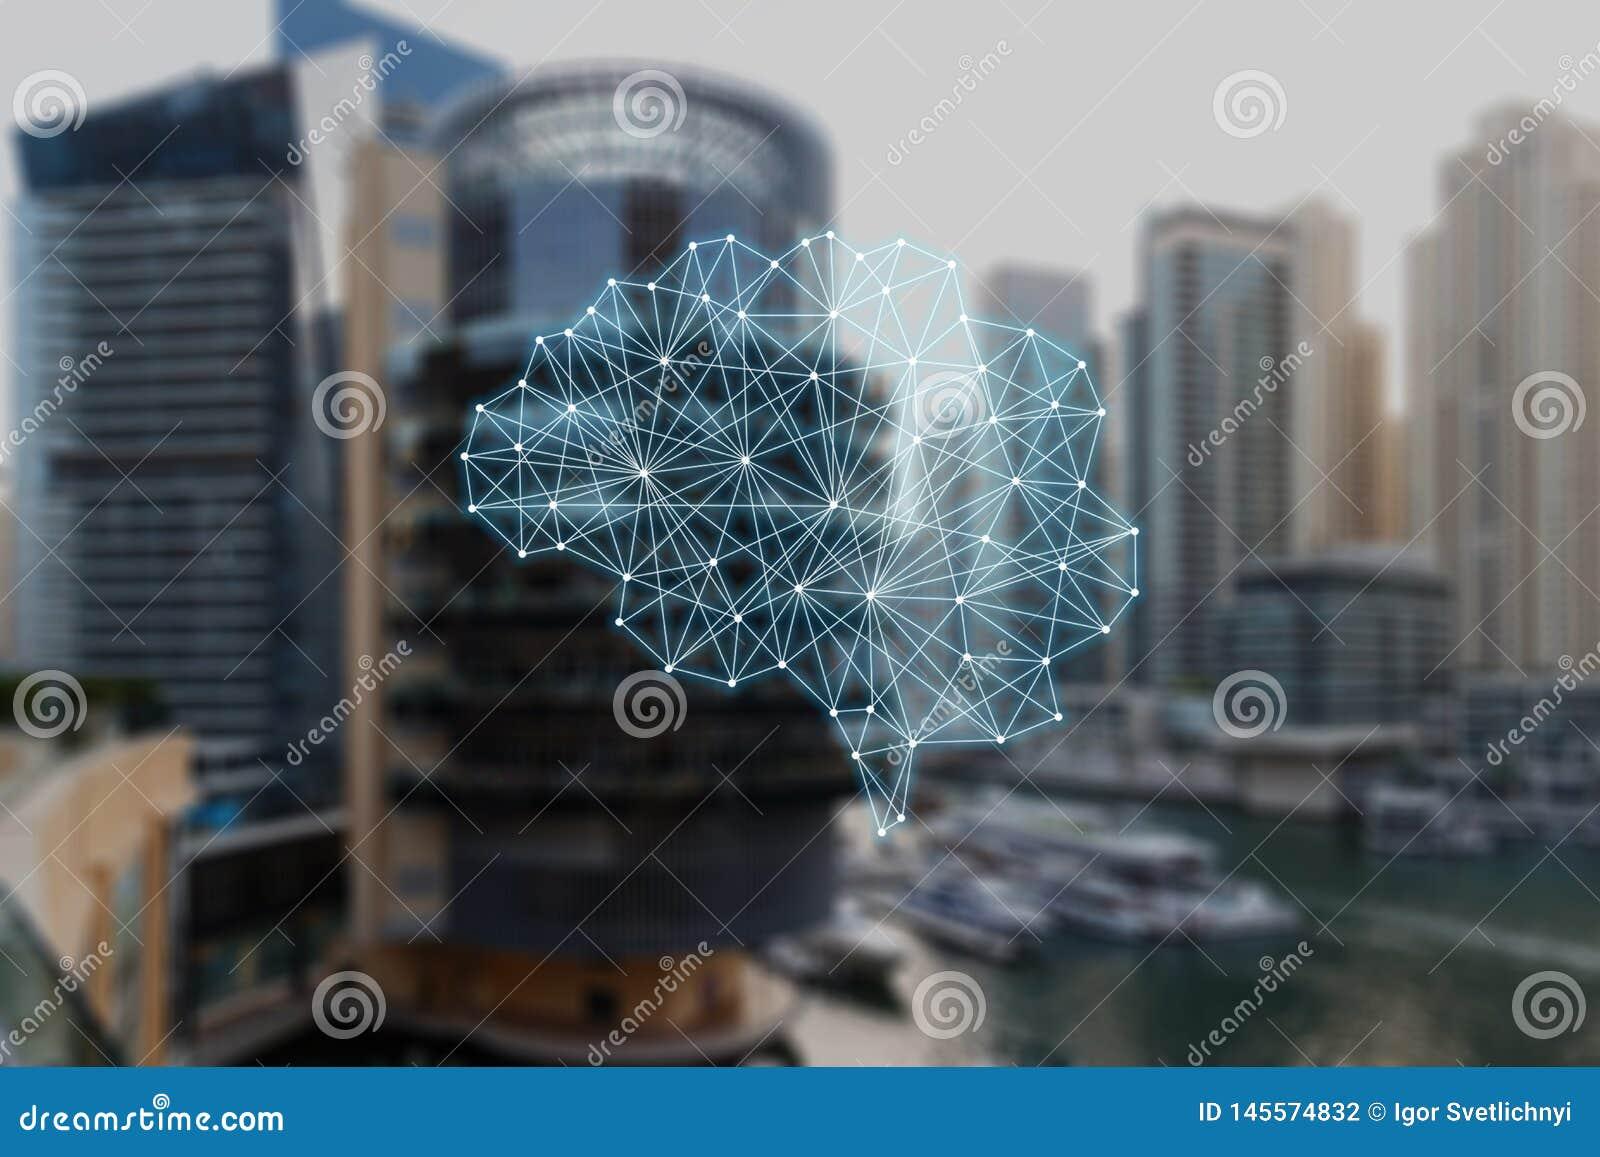 Das Konzept von autonomen Sachen